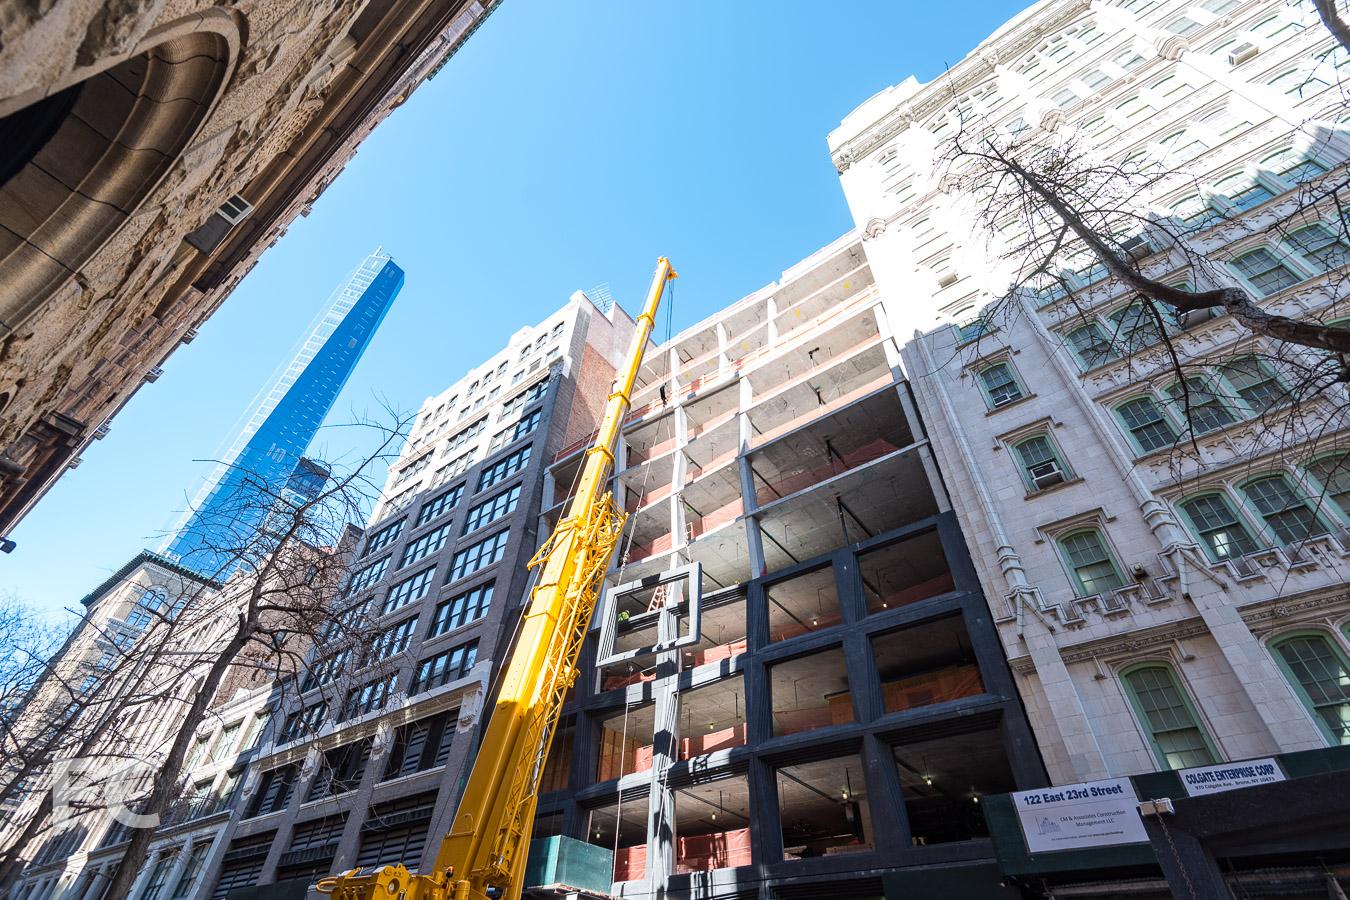 Crane lifts precast panel into place on the East 22nd Street façade.